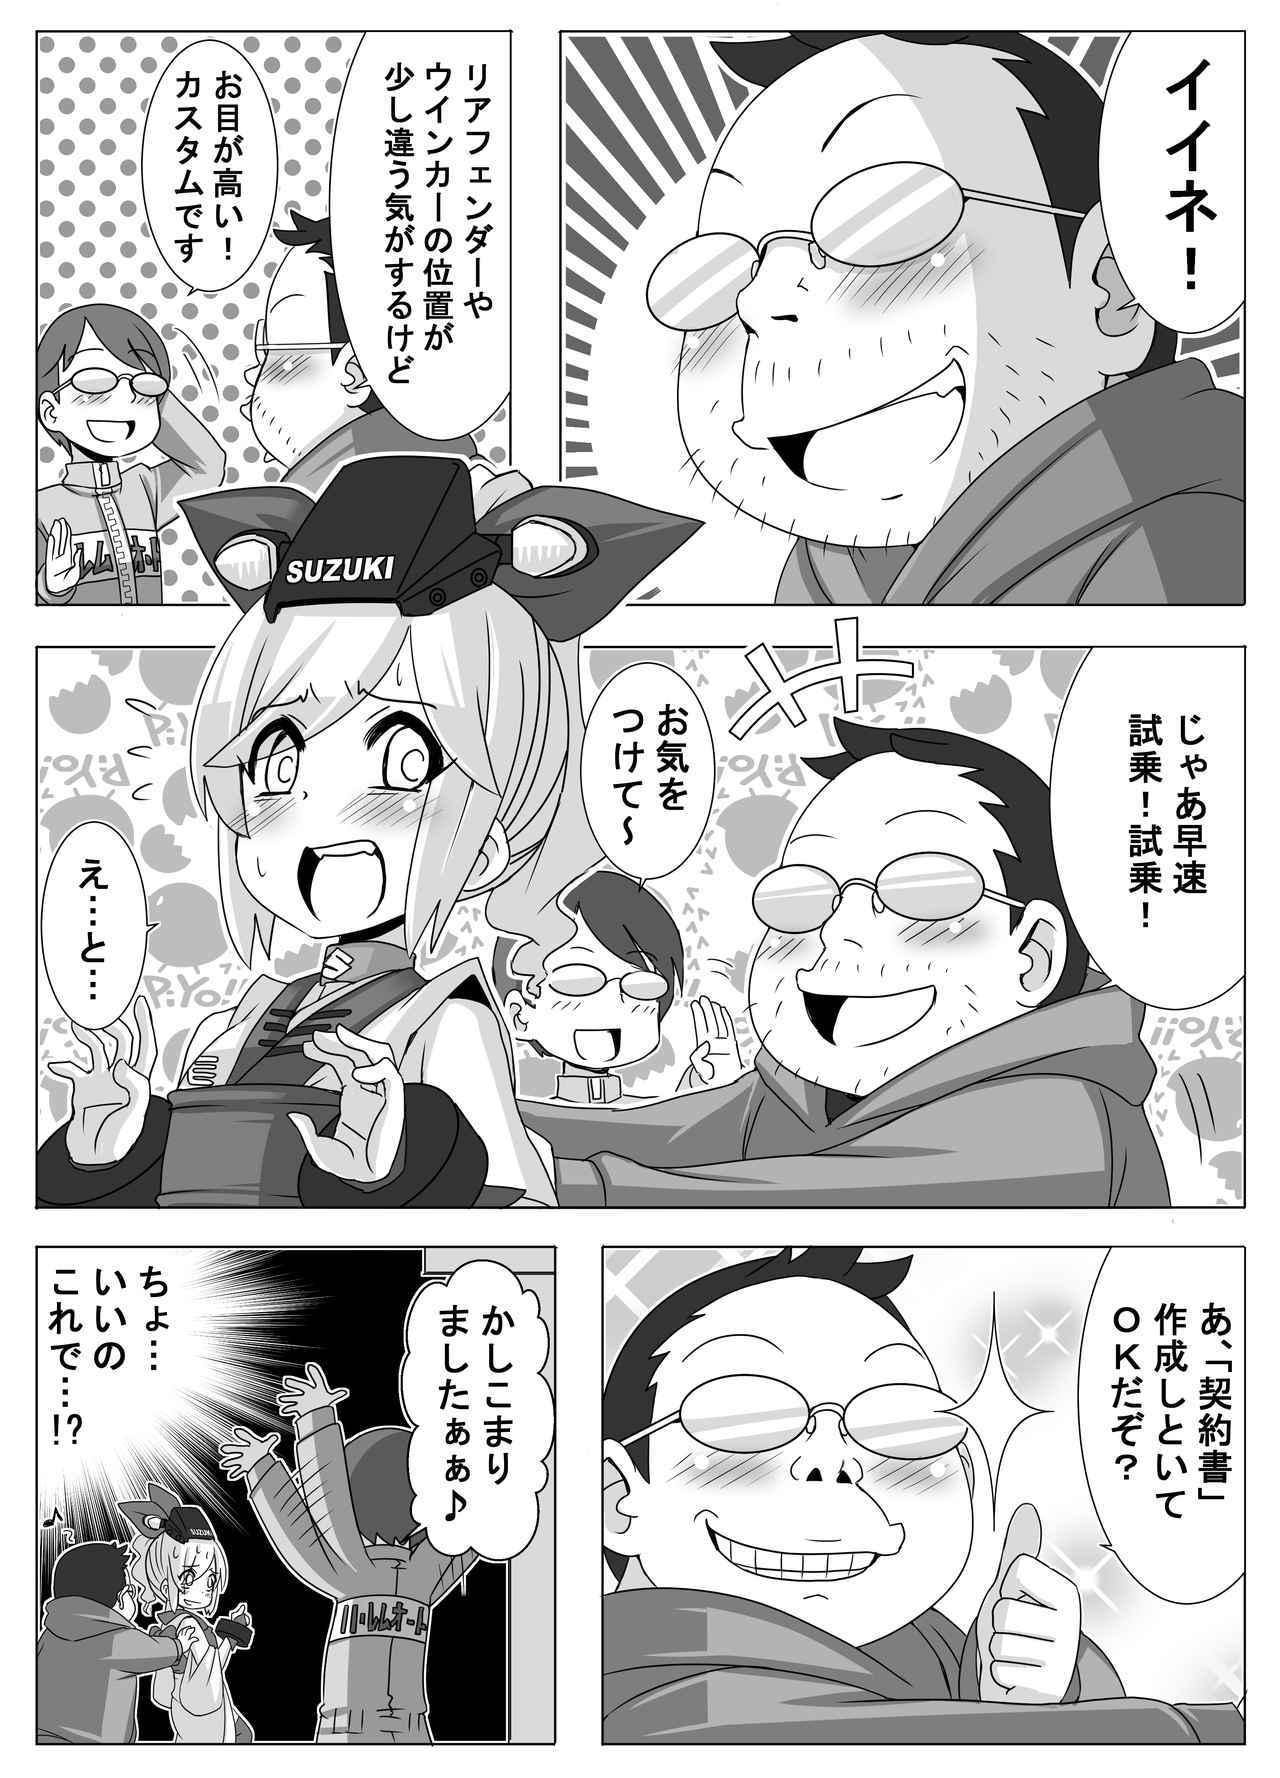 画像4: 『バイク擬人化菌書』GSX-S1000 話「代役」 作:鈴木秀吉